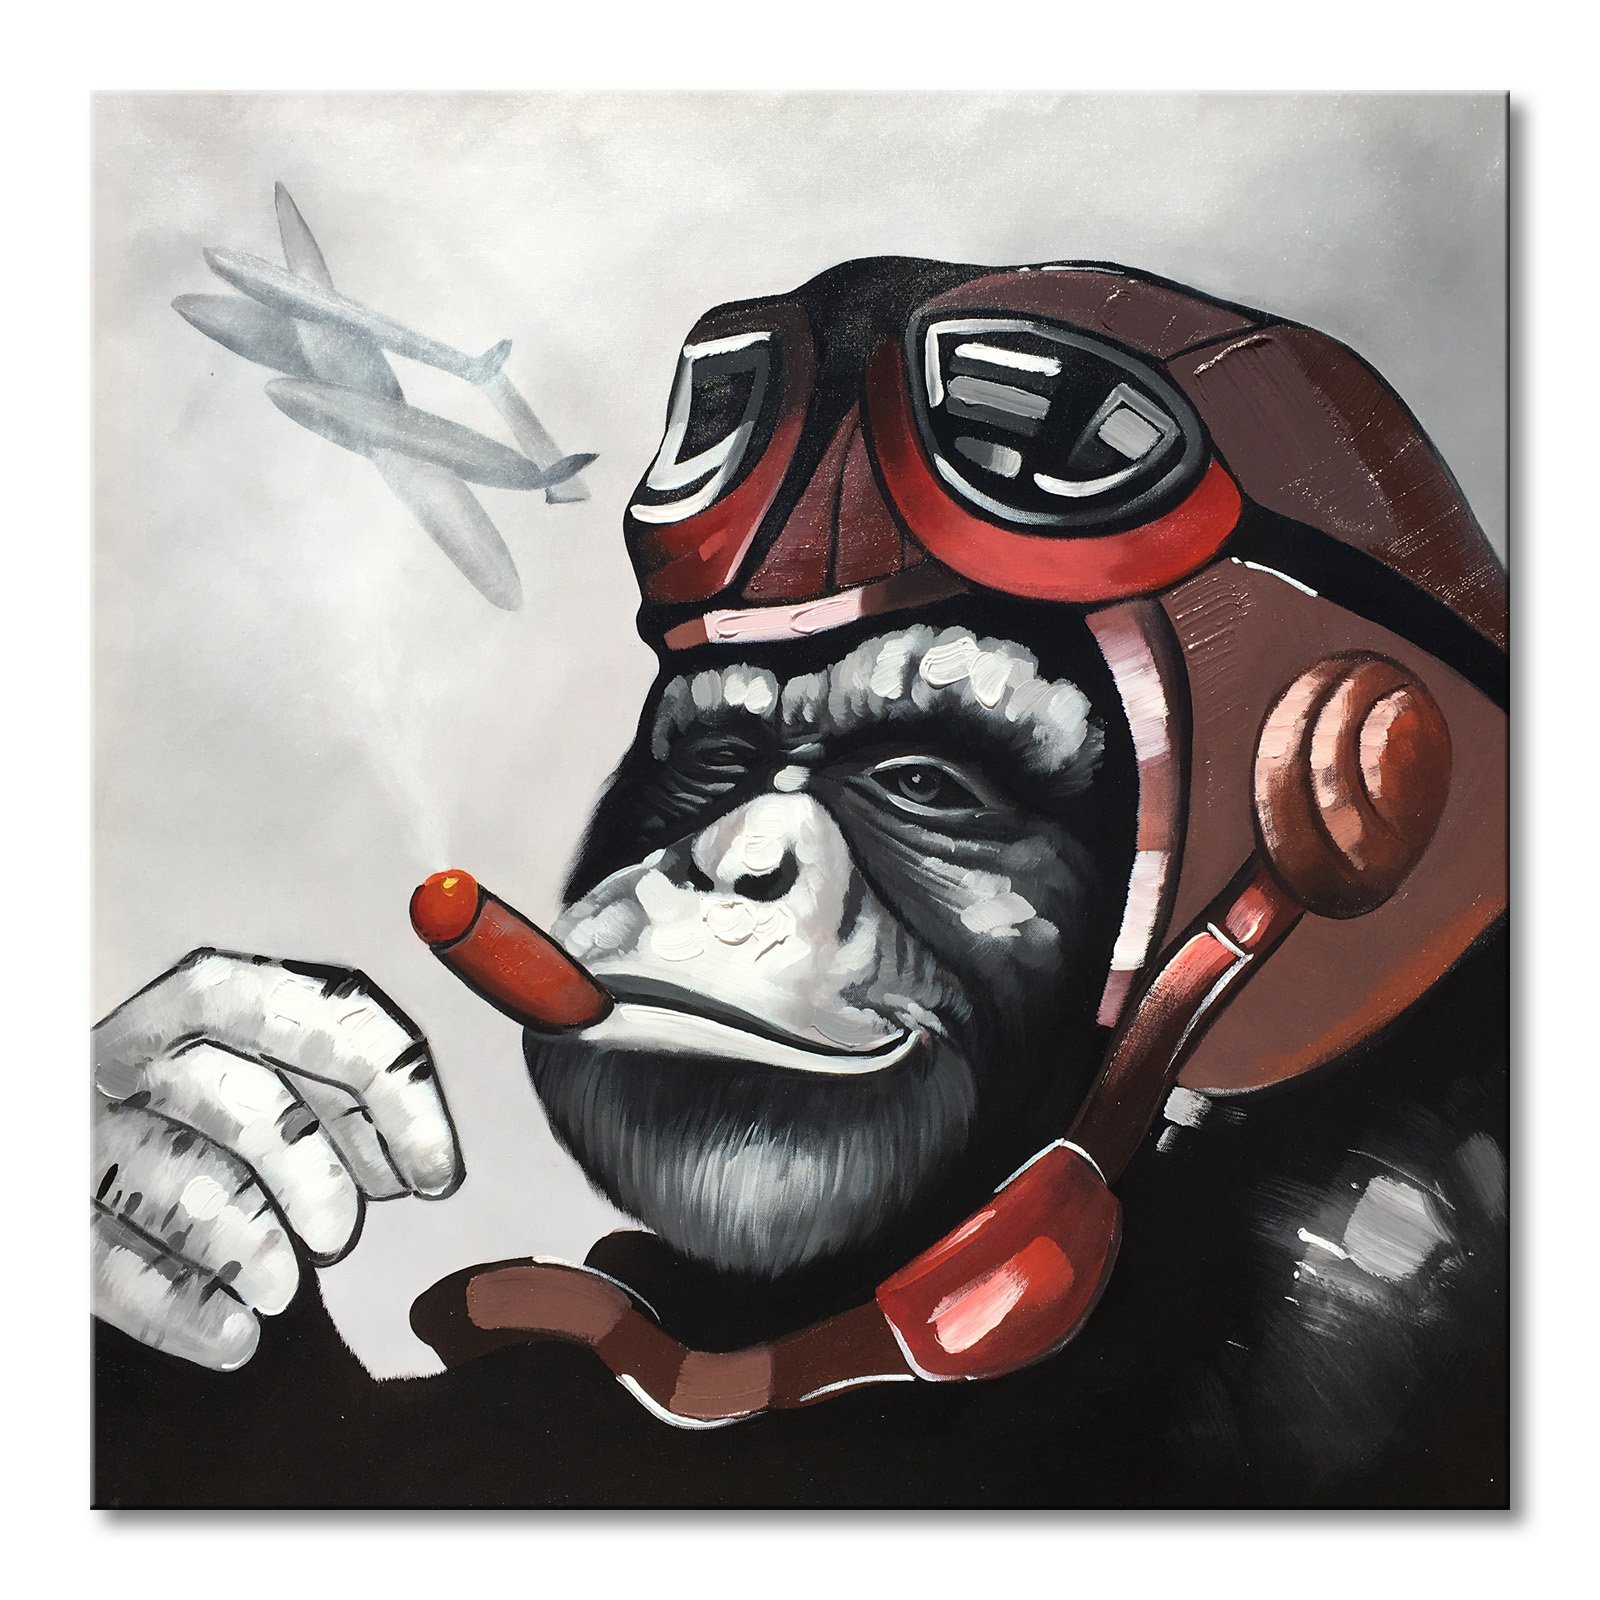 EVERFUN ART Everfun Pilot Gorilla Monkey Canvas Wall Art Abstract Animal Oil Painting Handmade Framed Modern Artwork Home Decoration Living Room Ready to Hang 32x32